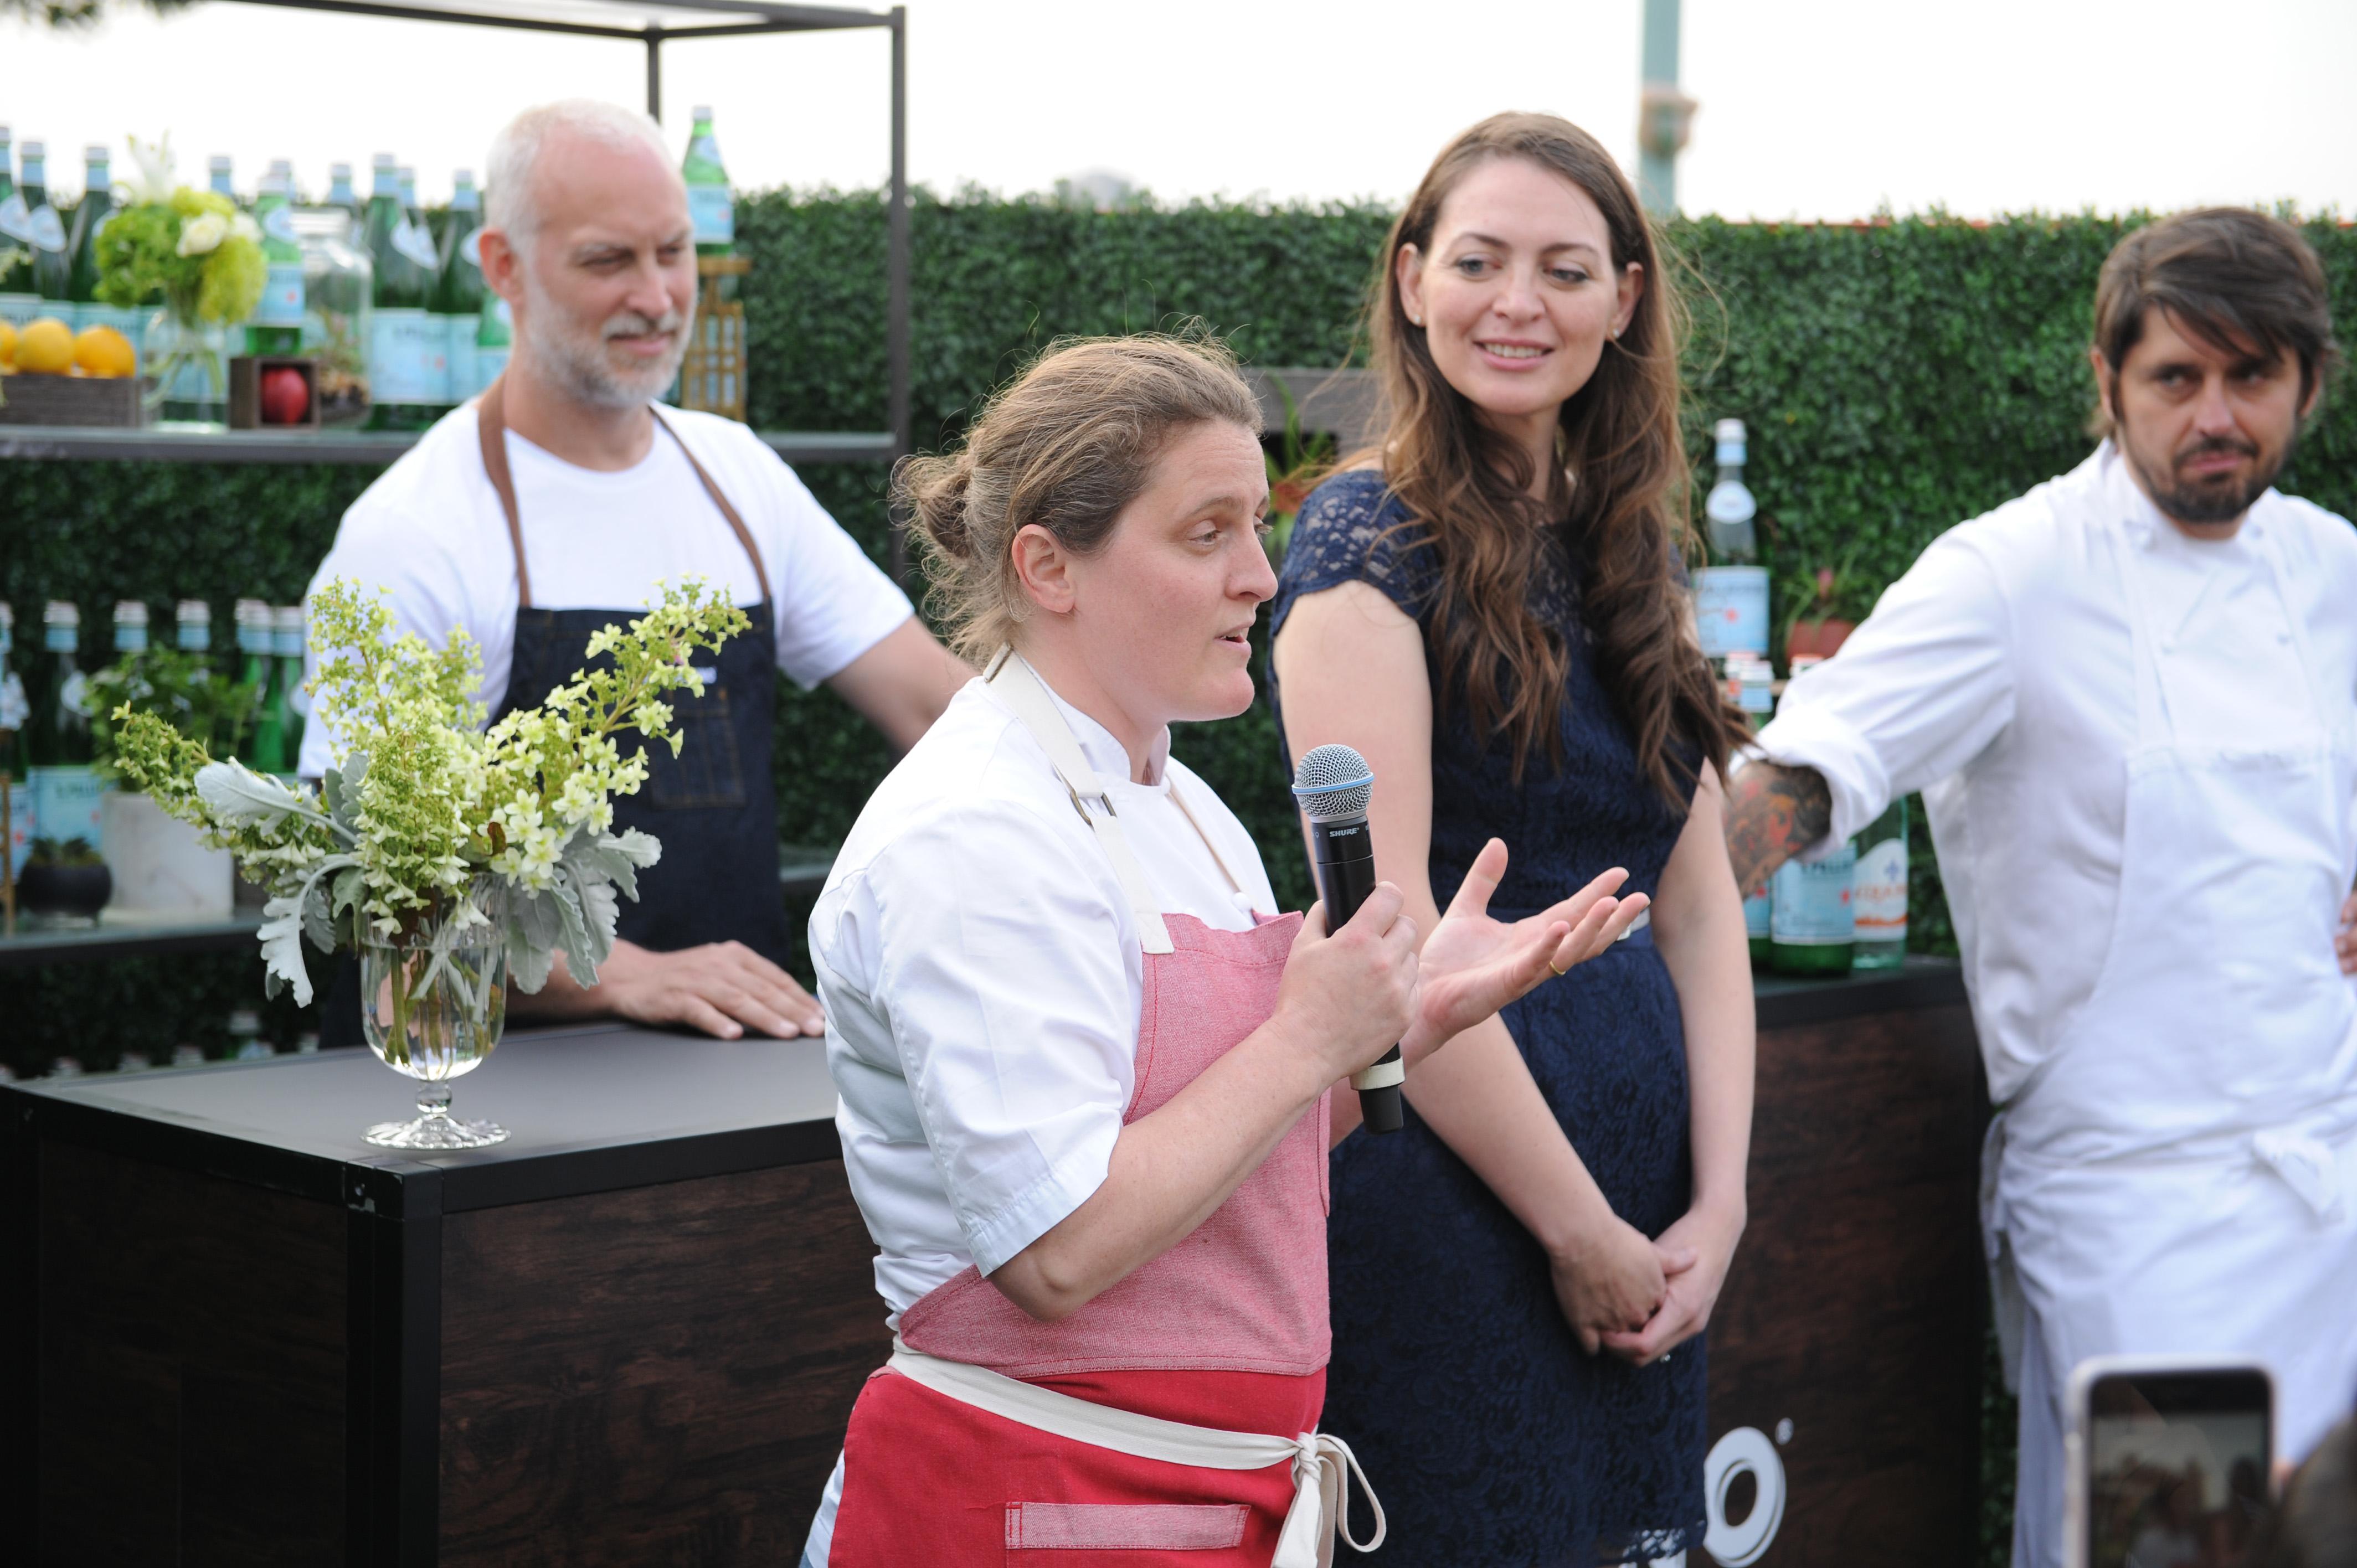 Dinner during S.Pellegrino Taste Guide Event With Chefs April Bloomfield & Ludo Lefebvre at Hudson River Park at Pier 46 on June 29, 2017 in New York City.